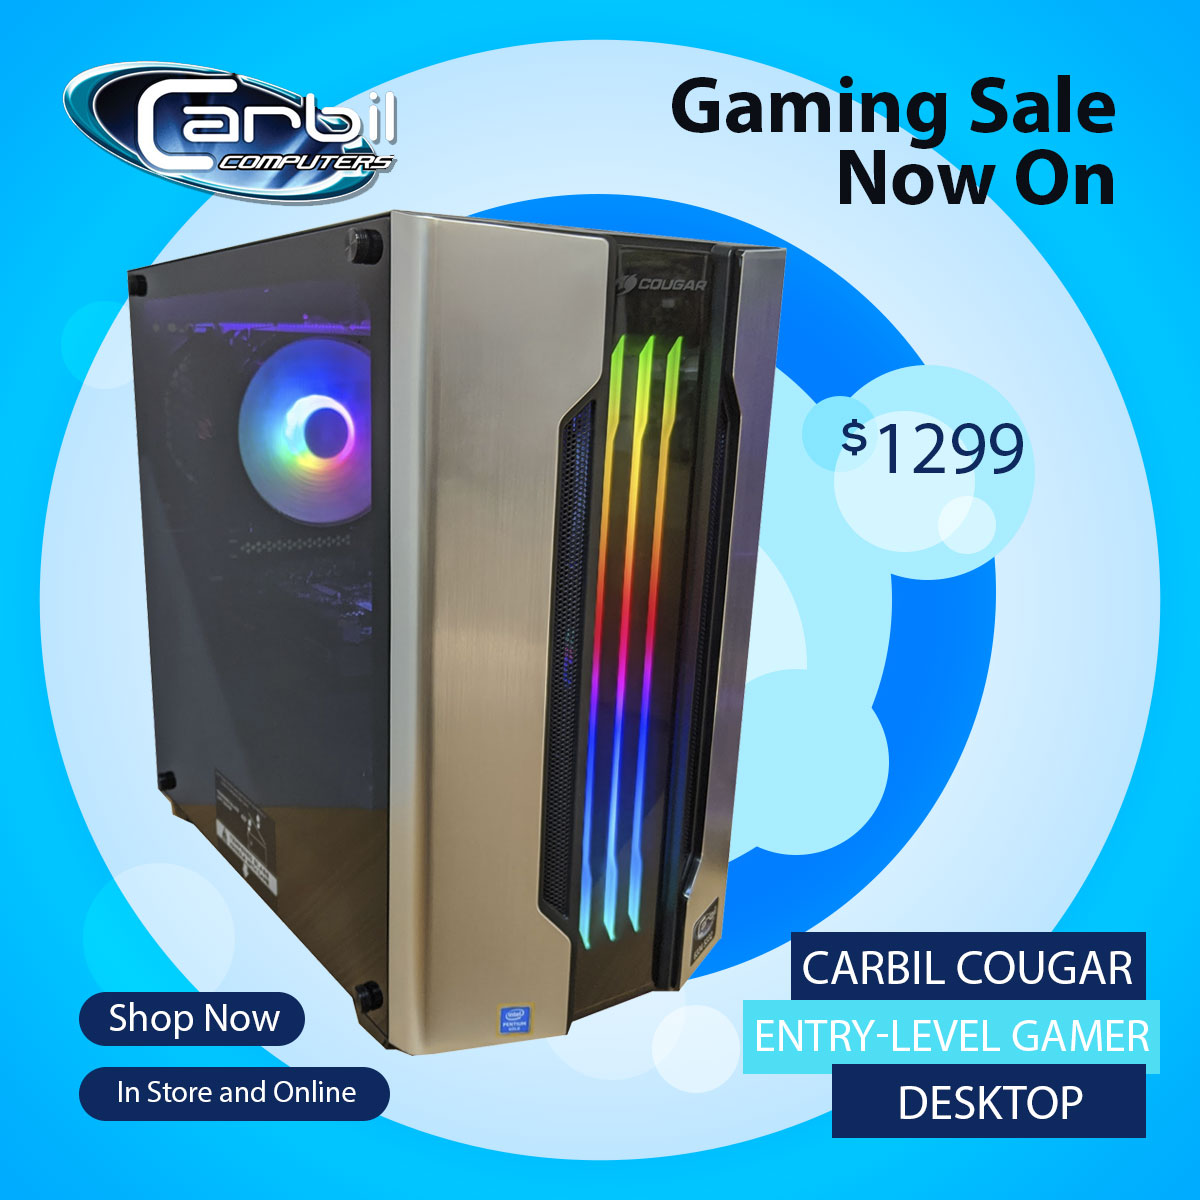 Gaming Sale